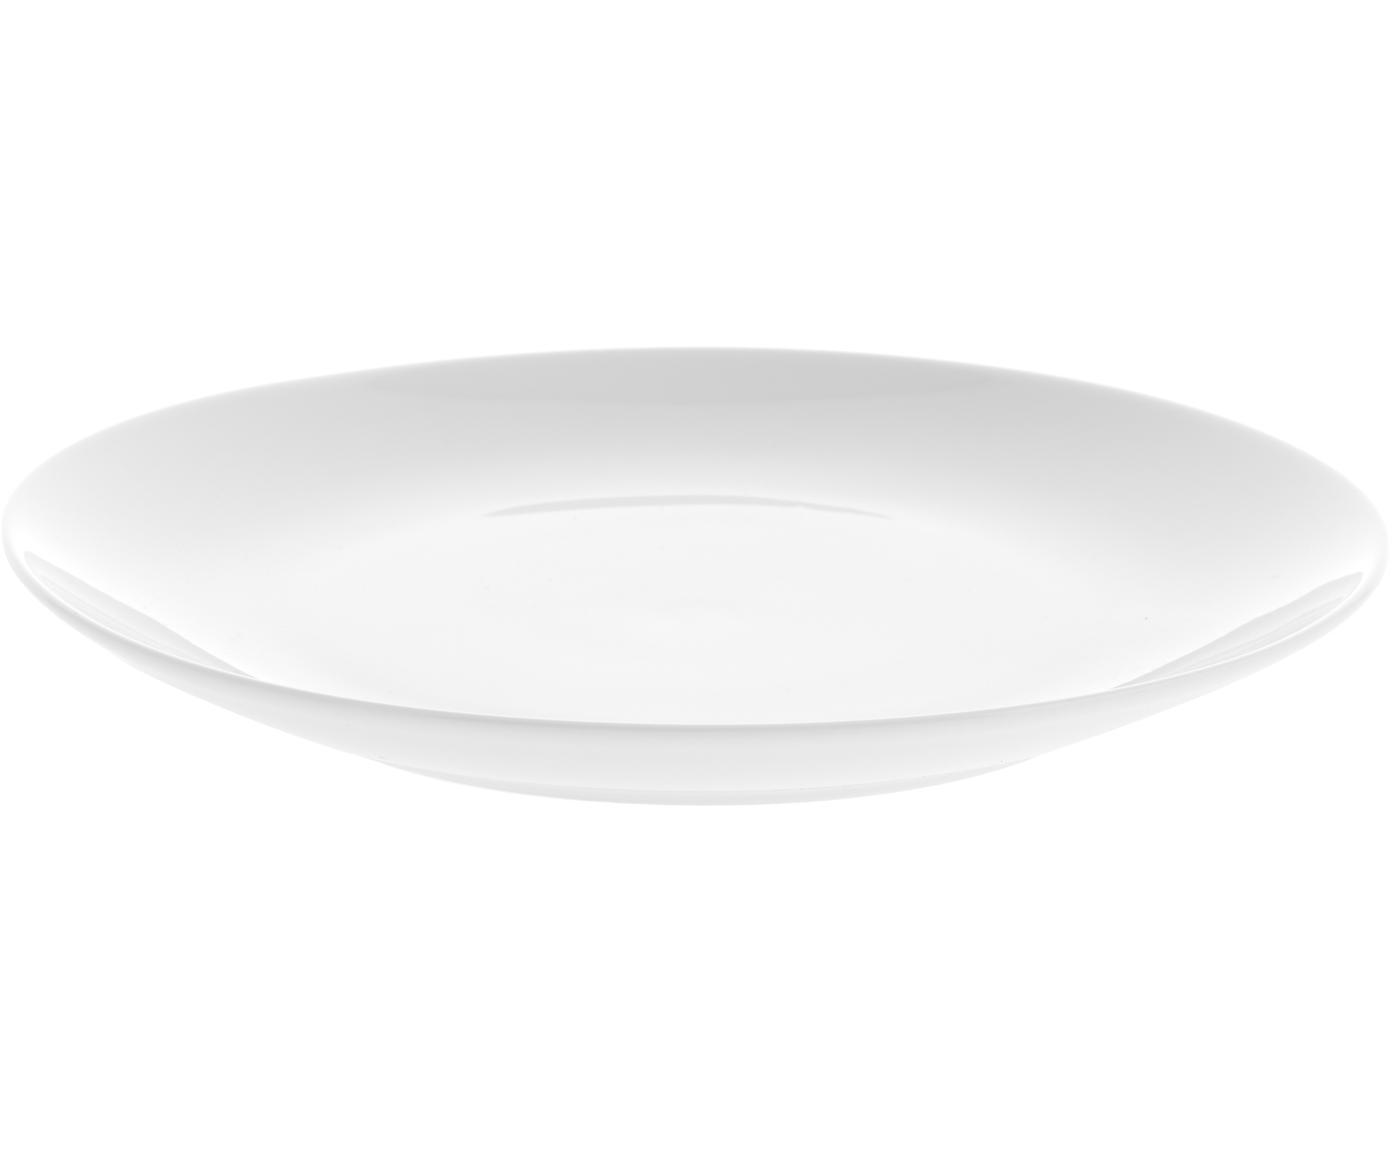 Piattino da dessert Delight Modern 2 pz, Porcellana, Bianco, Ø 20 cm